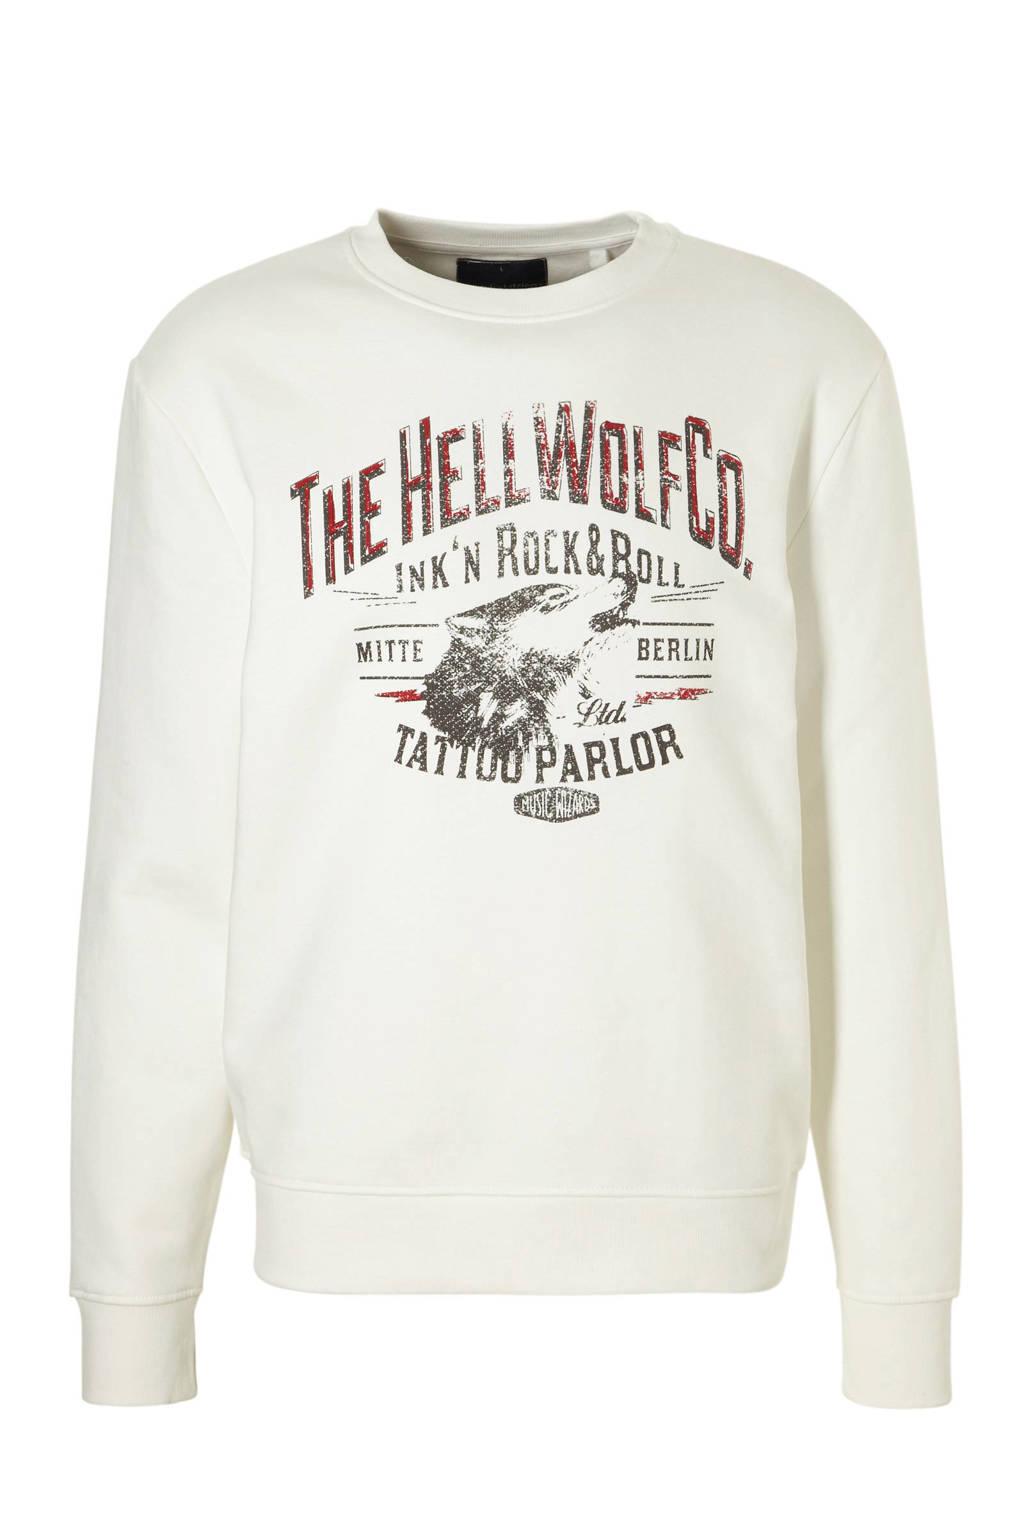 C&A Angelo Litrico sweater met printopdruk, Snowwhite